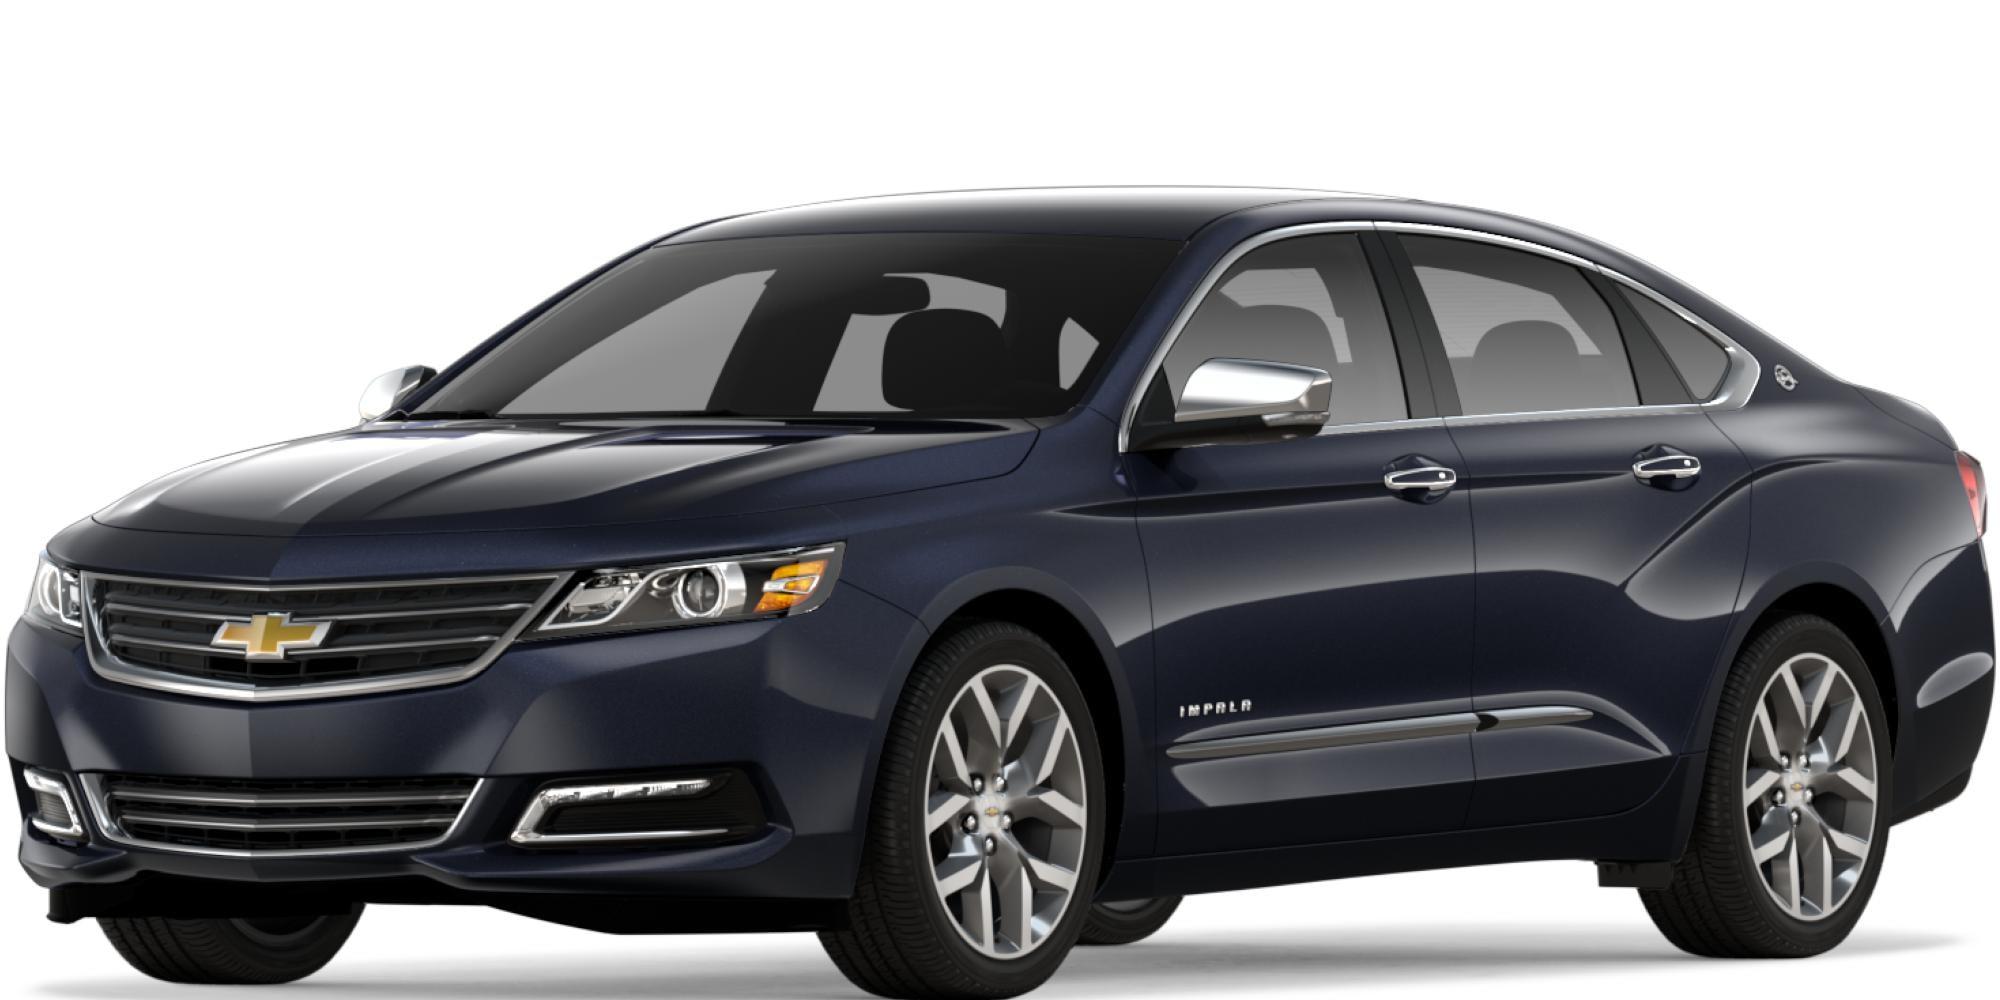 2018 impala full size car full size sedan chevrolet 2018 Chevy Malibu Interior blue velvet metallic